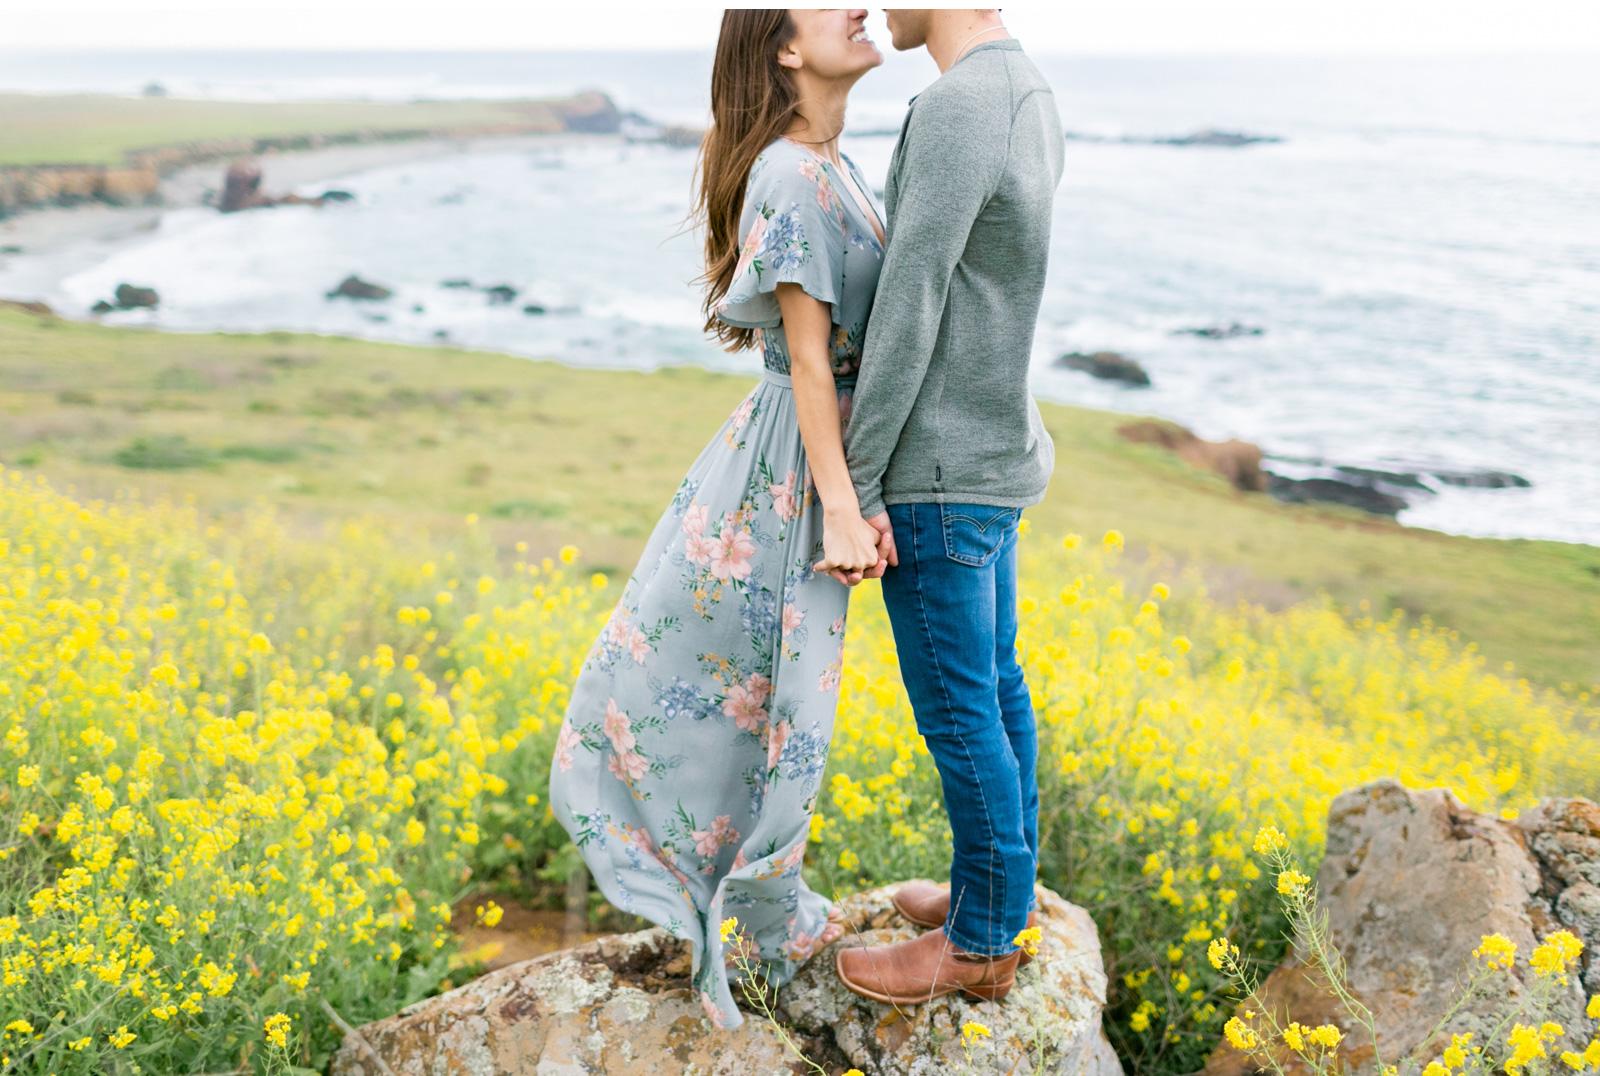 Saddlerock-Ranch-Malibu-Wedding-Natalie-Schutt-Photography-Romantic-Florals-Rolling-Hills-Engagement_18.jpg